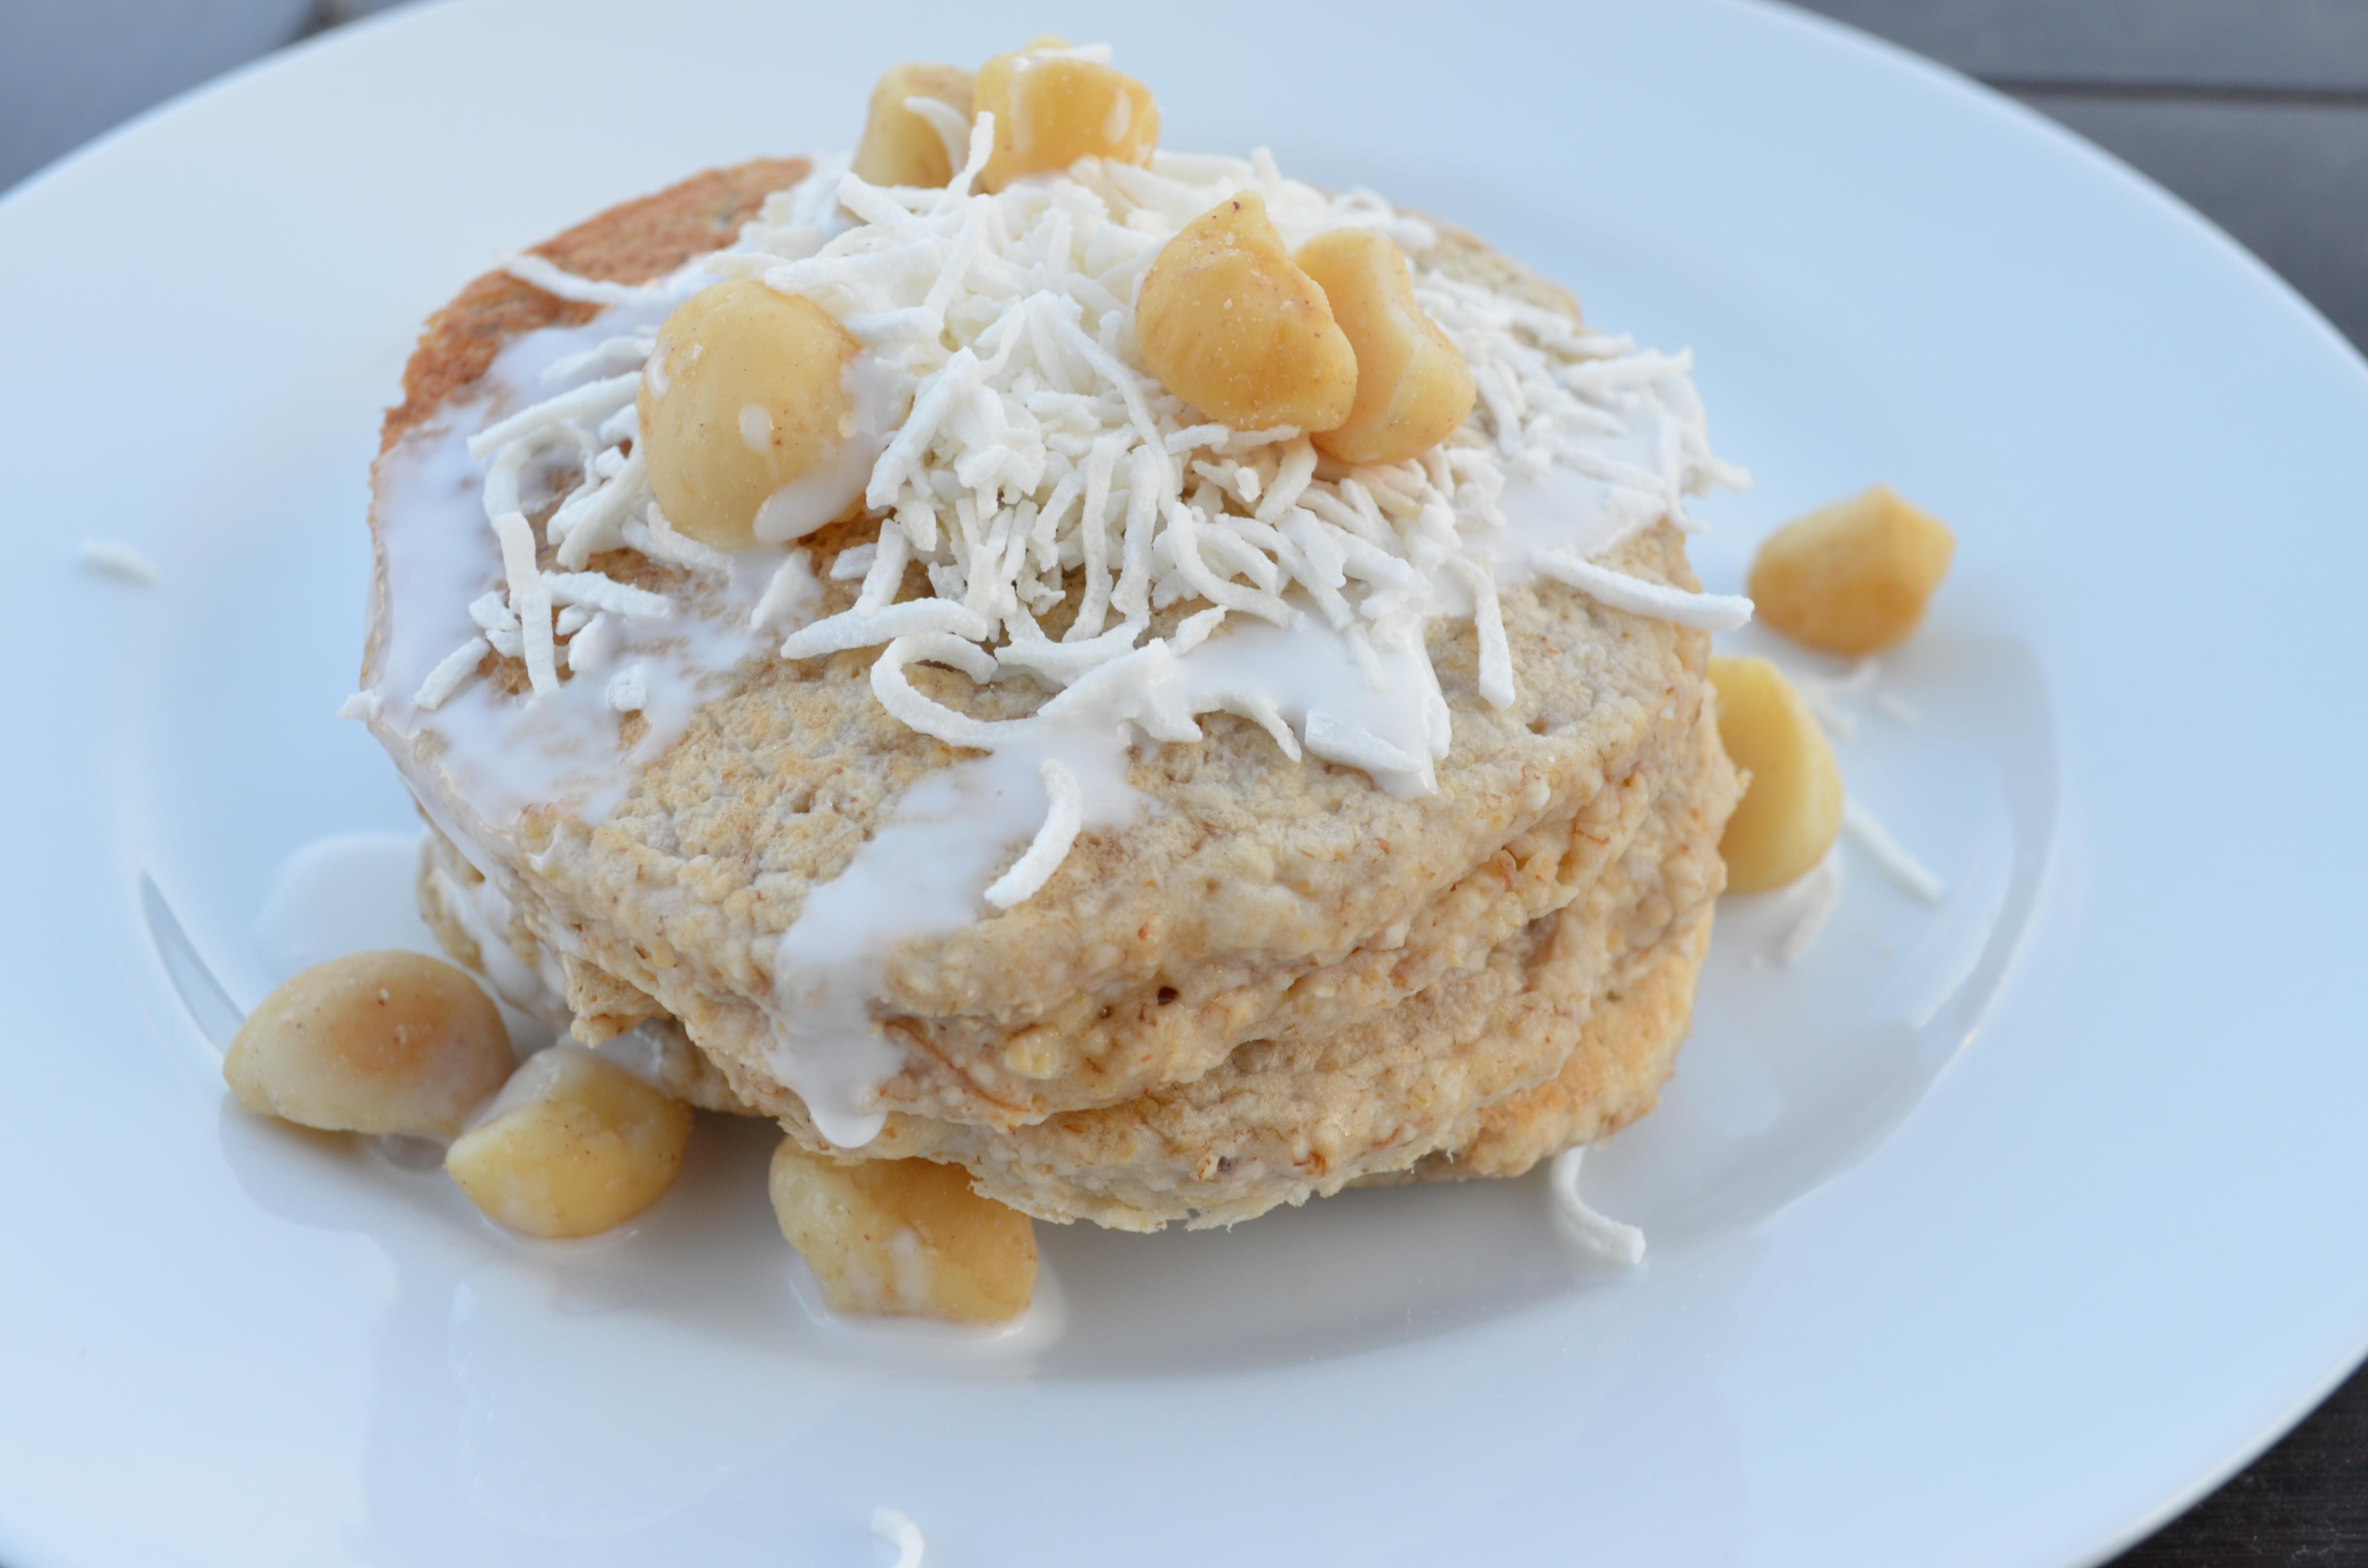 Macadamia Nut Banana Pancakes